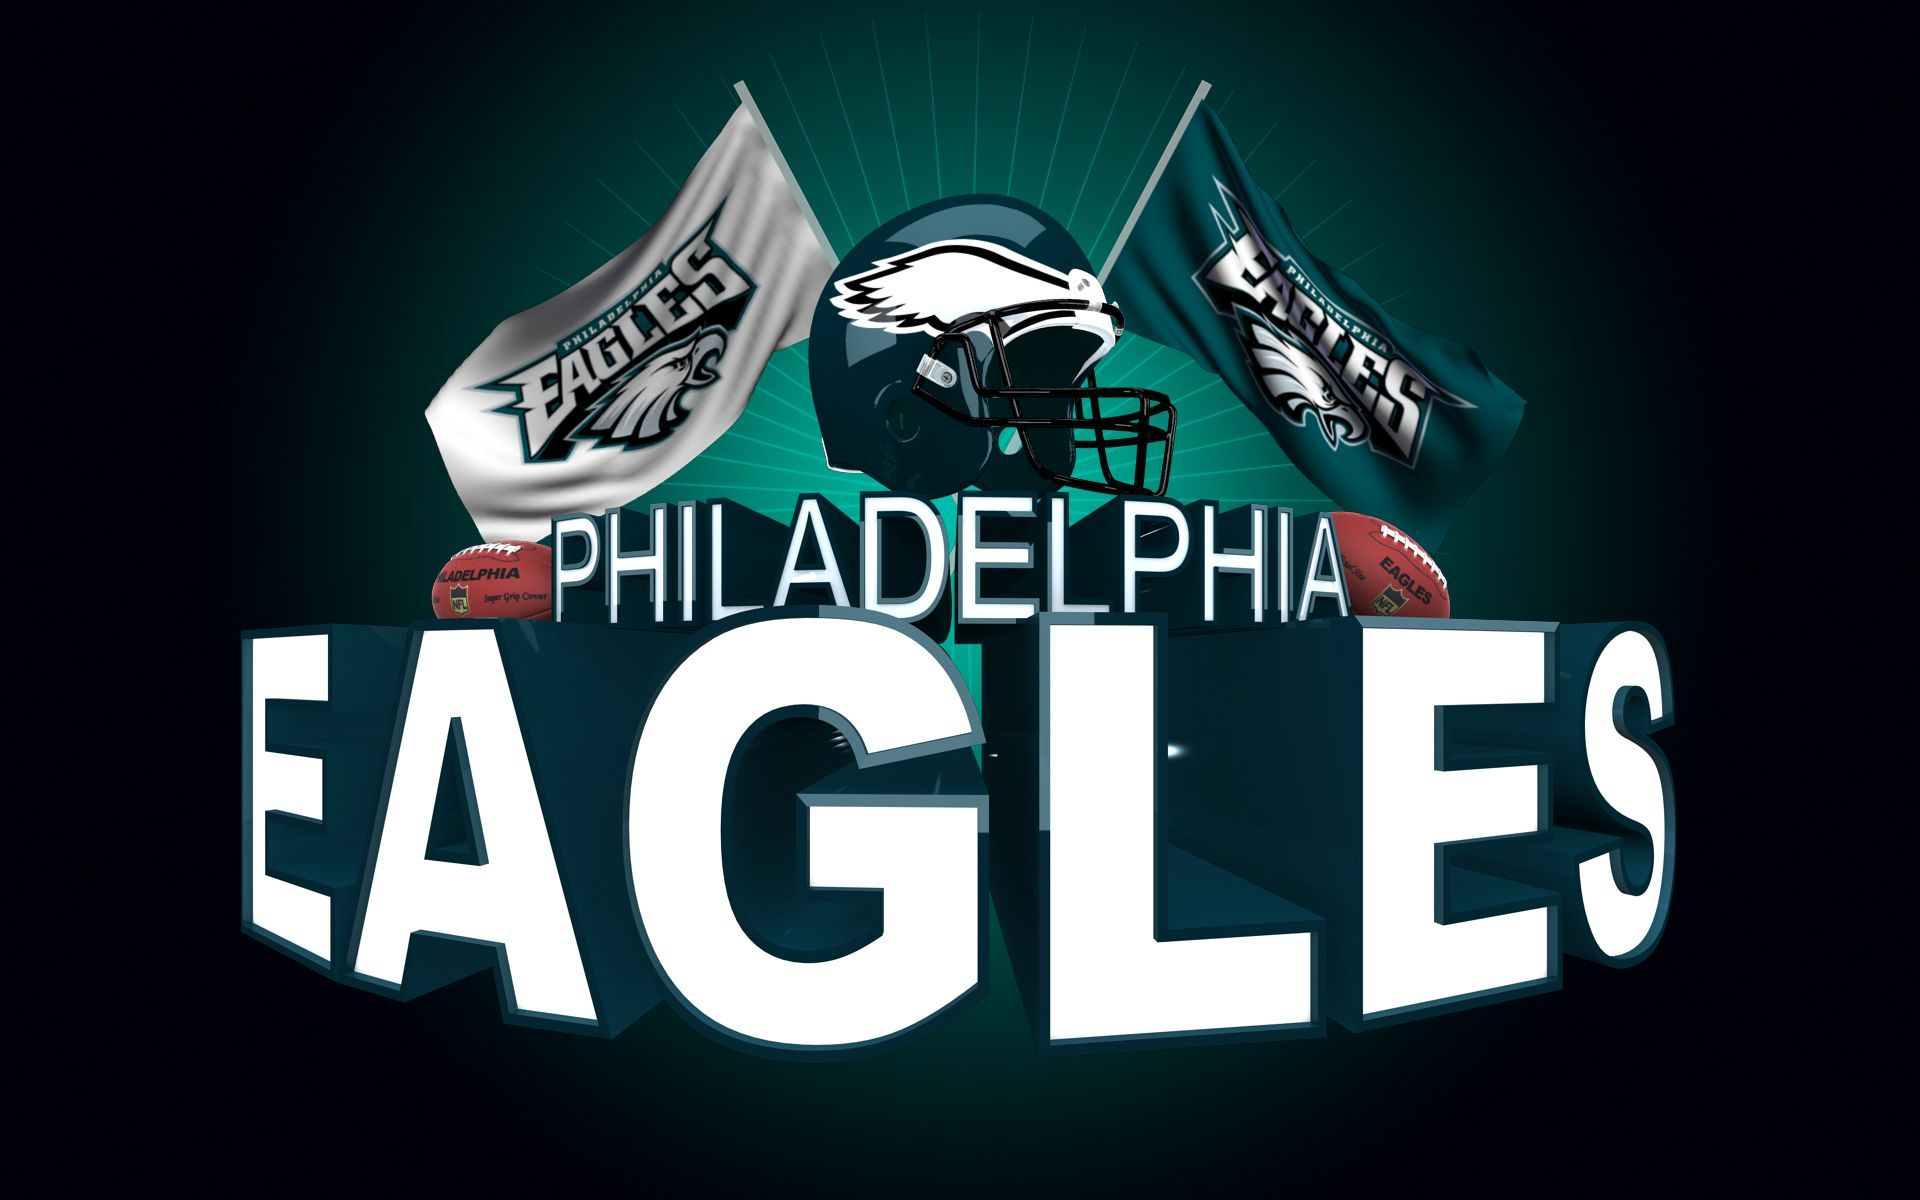 Eagles Logo Wallpapers Wallpaper HD Wallpapers